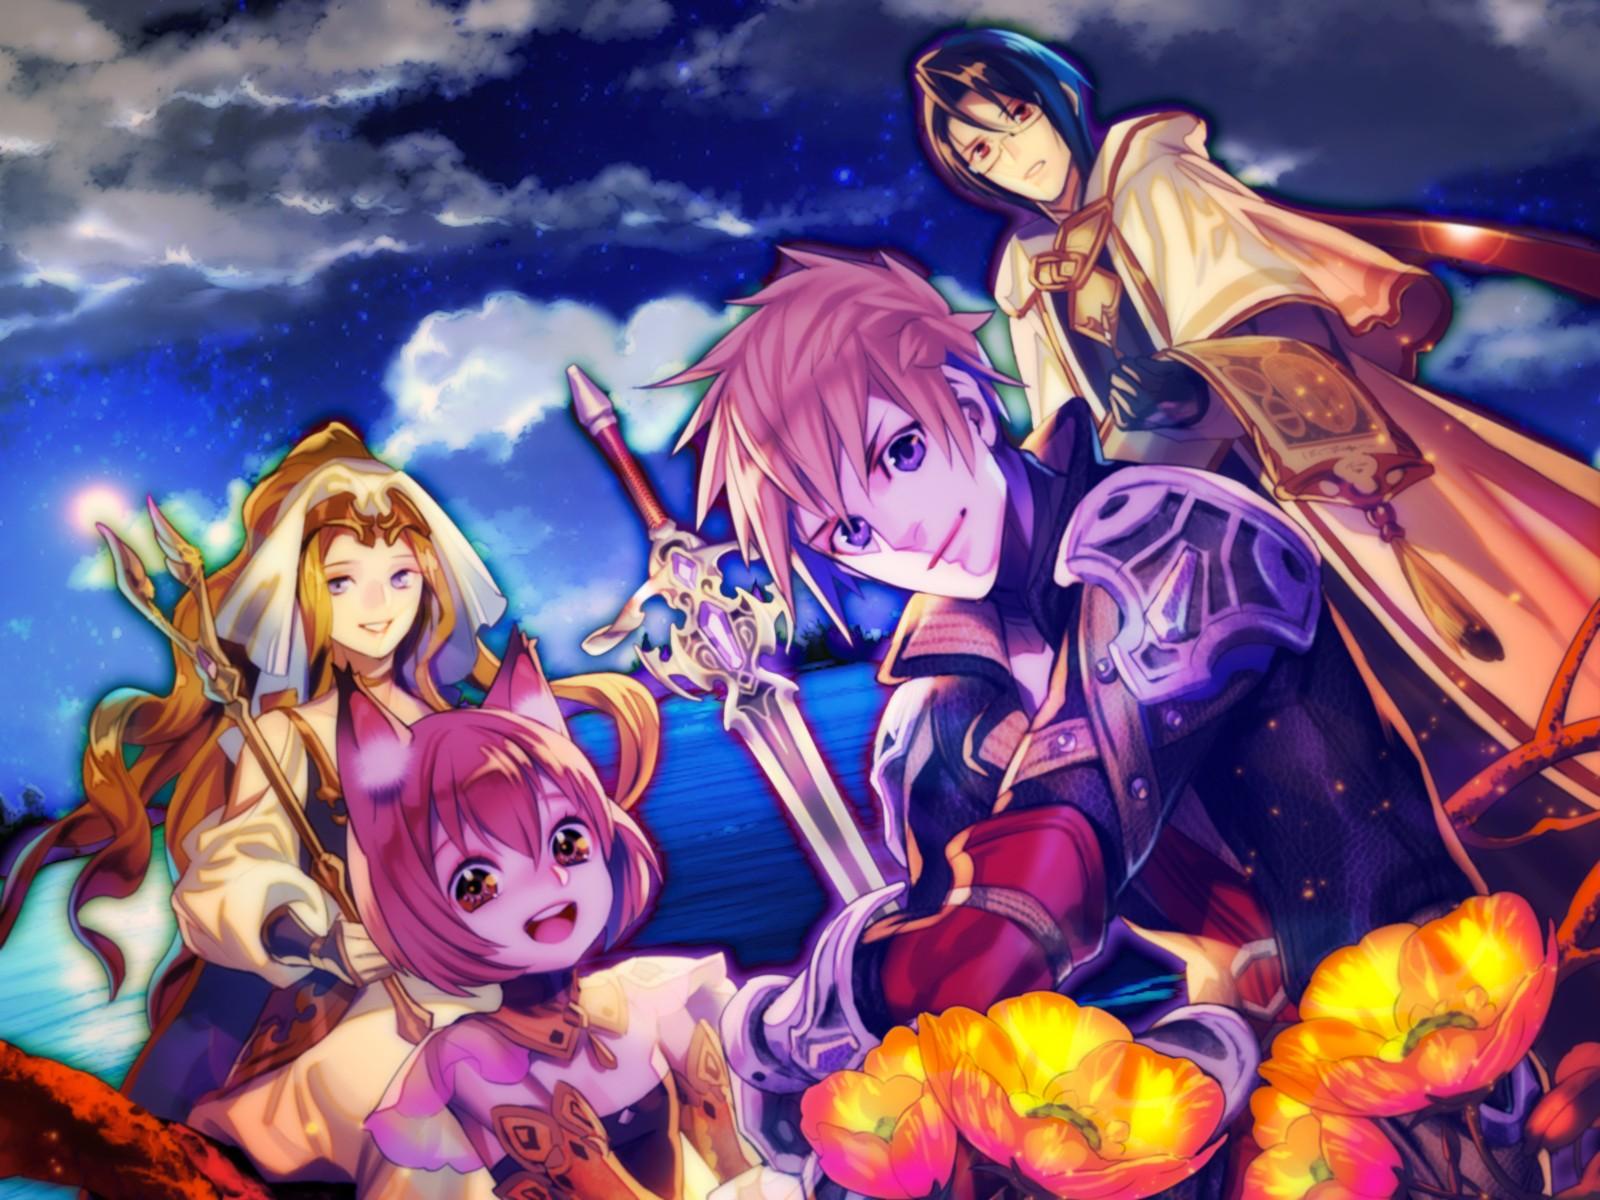 Anime Rpg Mythology Rpg Maker Screenshot Computer Wallpaper Mangaka